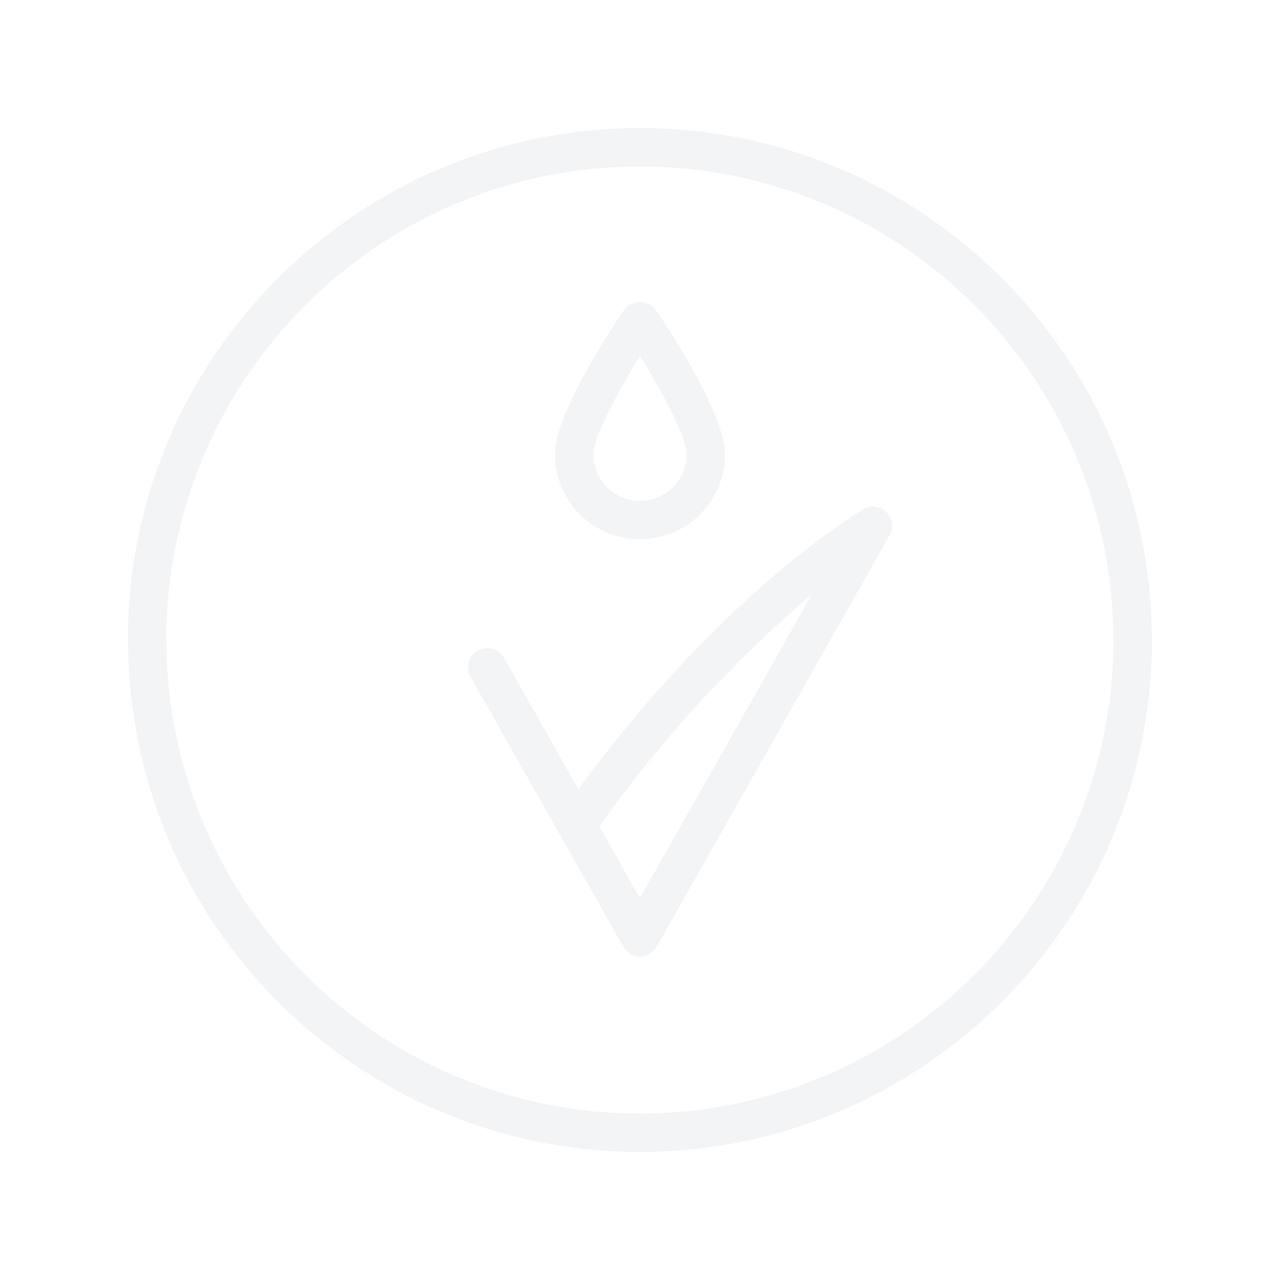 AVENE Antirougeurs Moisturizing Protecting Cream SPF20 40ml